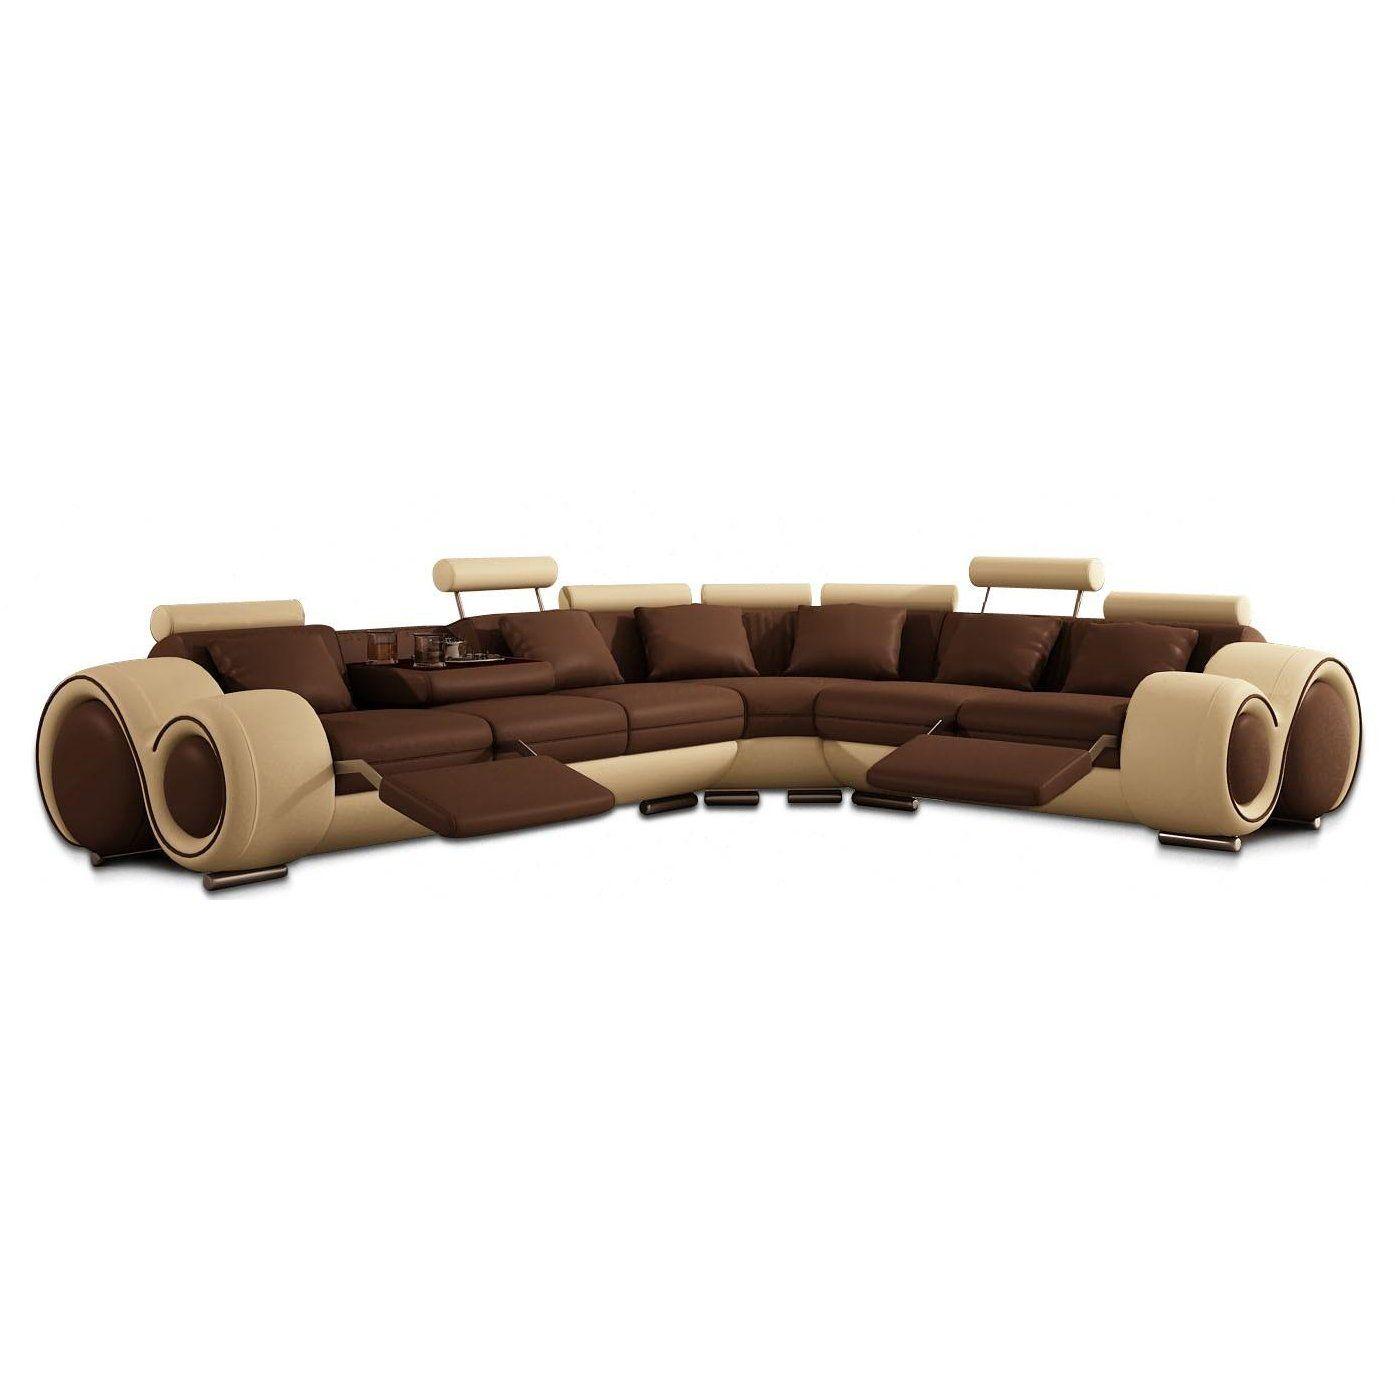 Vig Furniture 26 4 2833 Modern Sectional Sofa ATG Stores